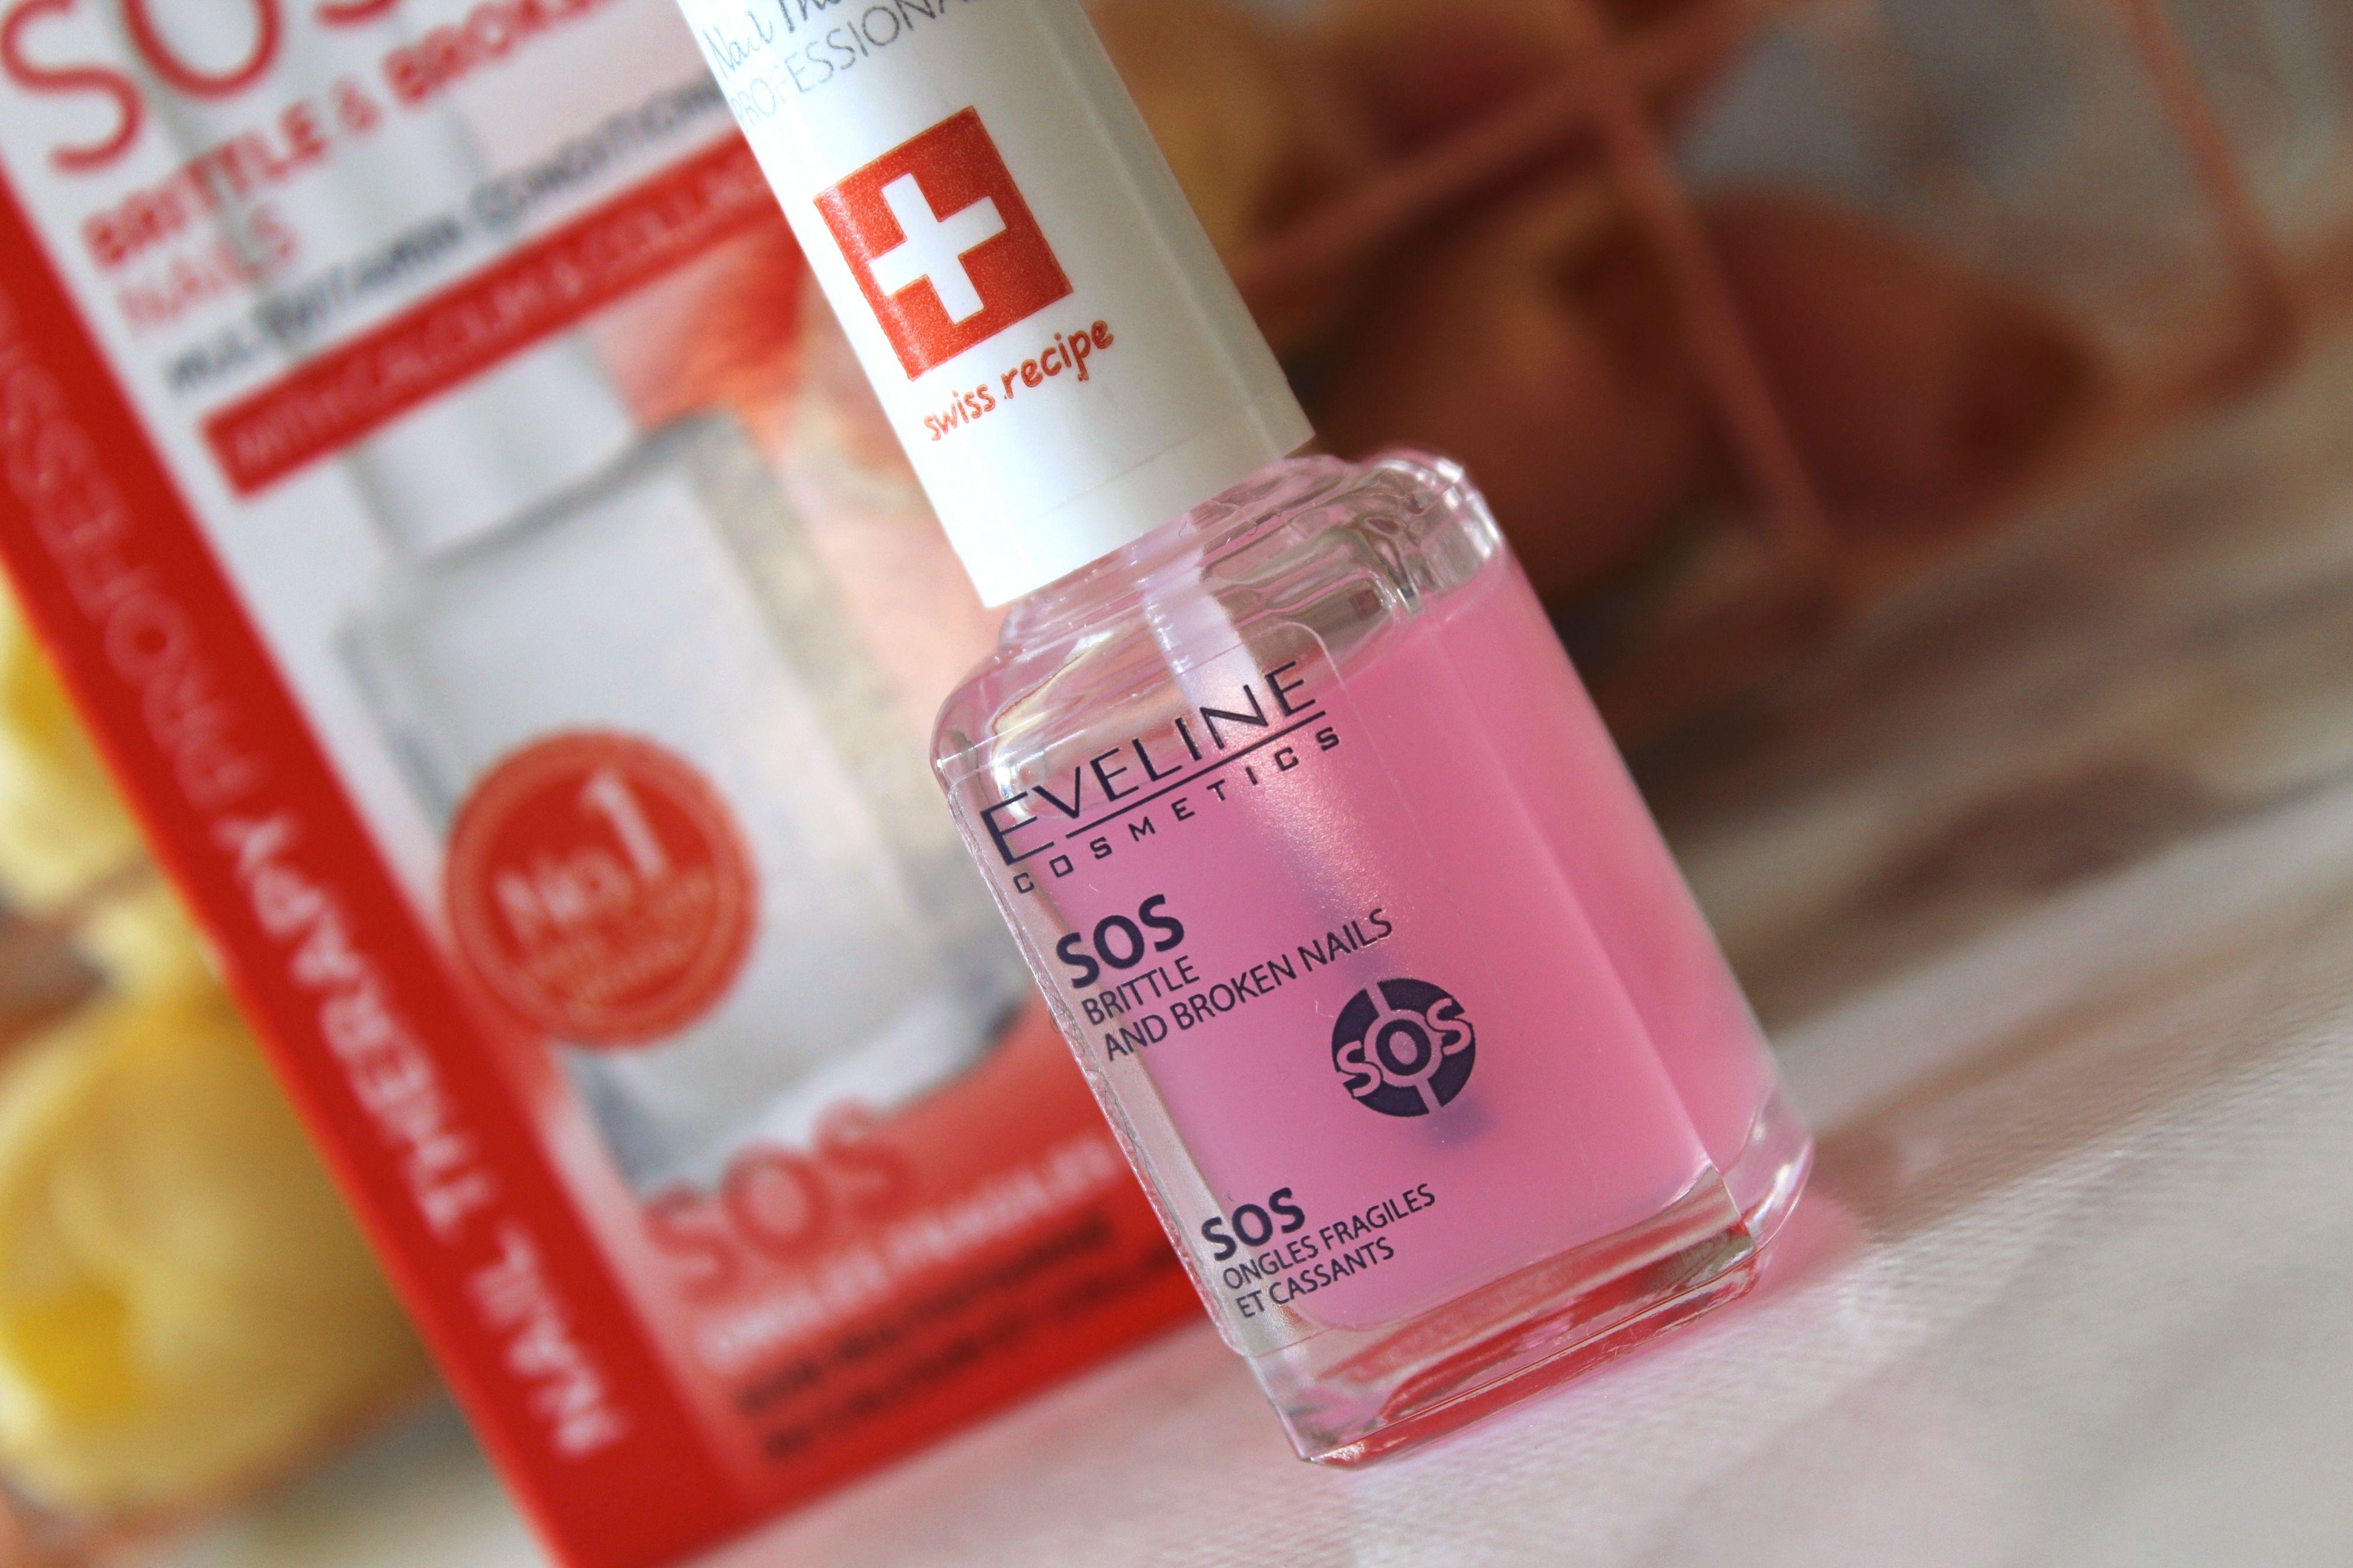 Eveline Cosmetics Sos Brittle Broken Nails Multivitamin Conditioner Review Recenzija Simple Serenity